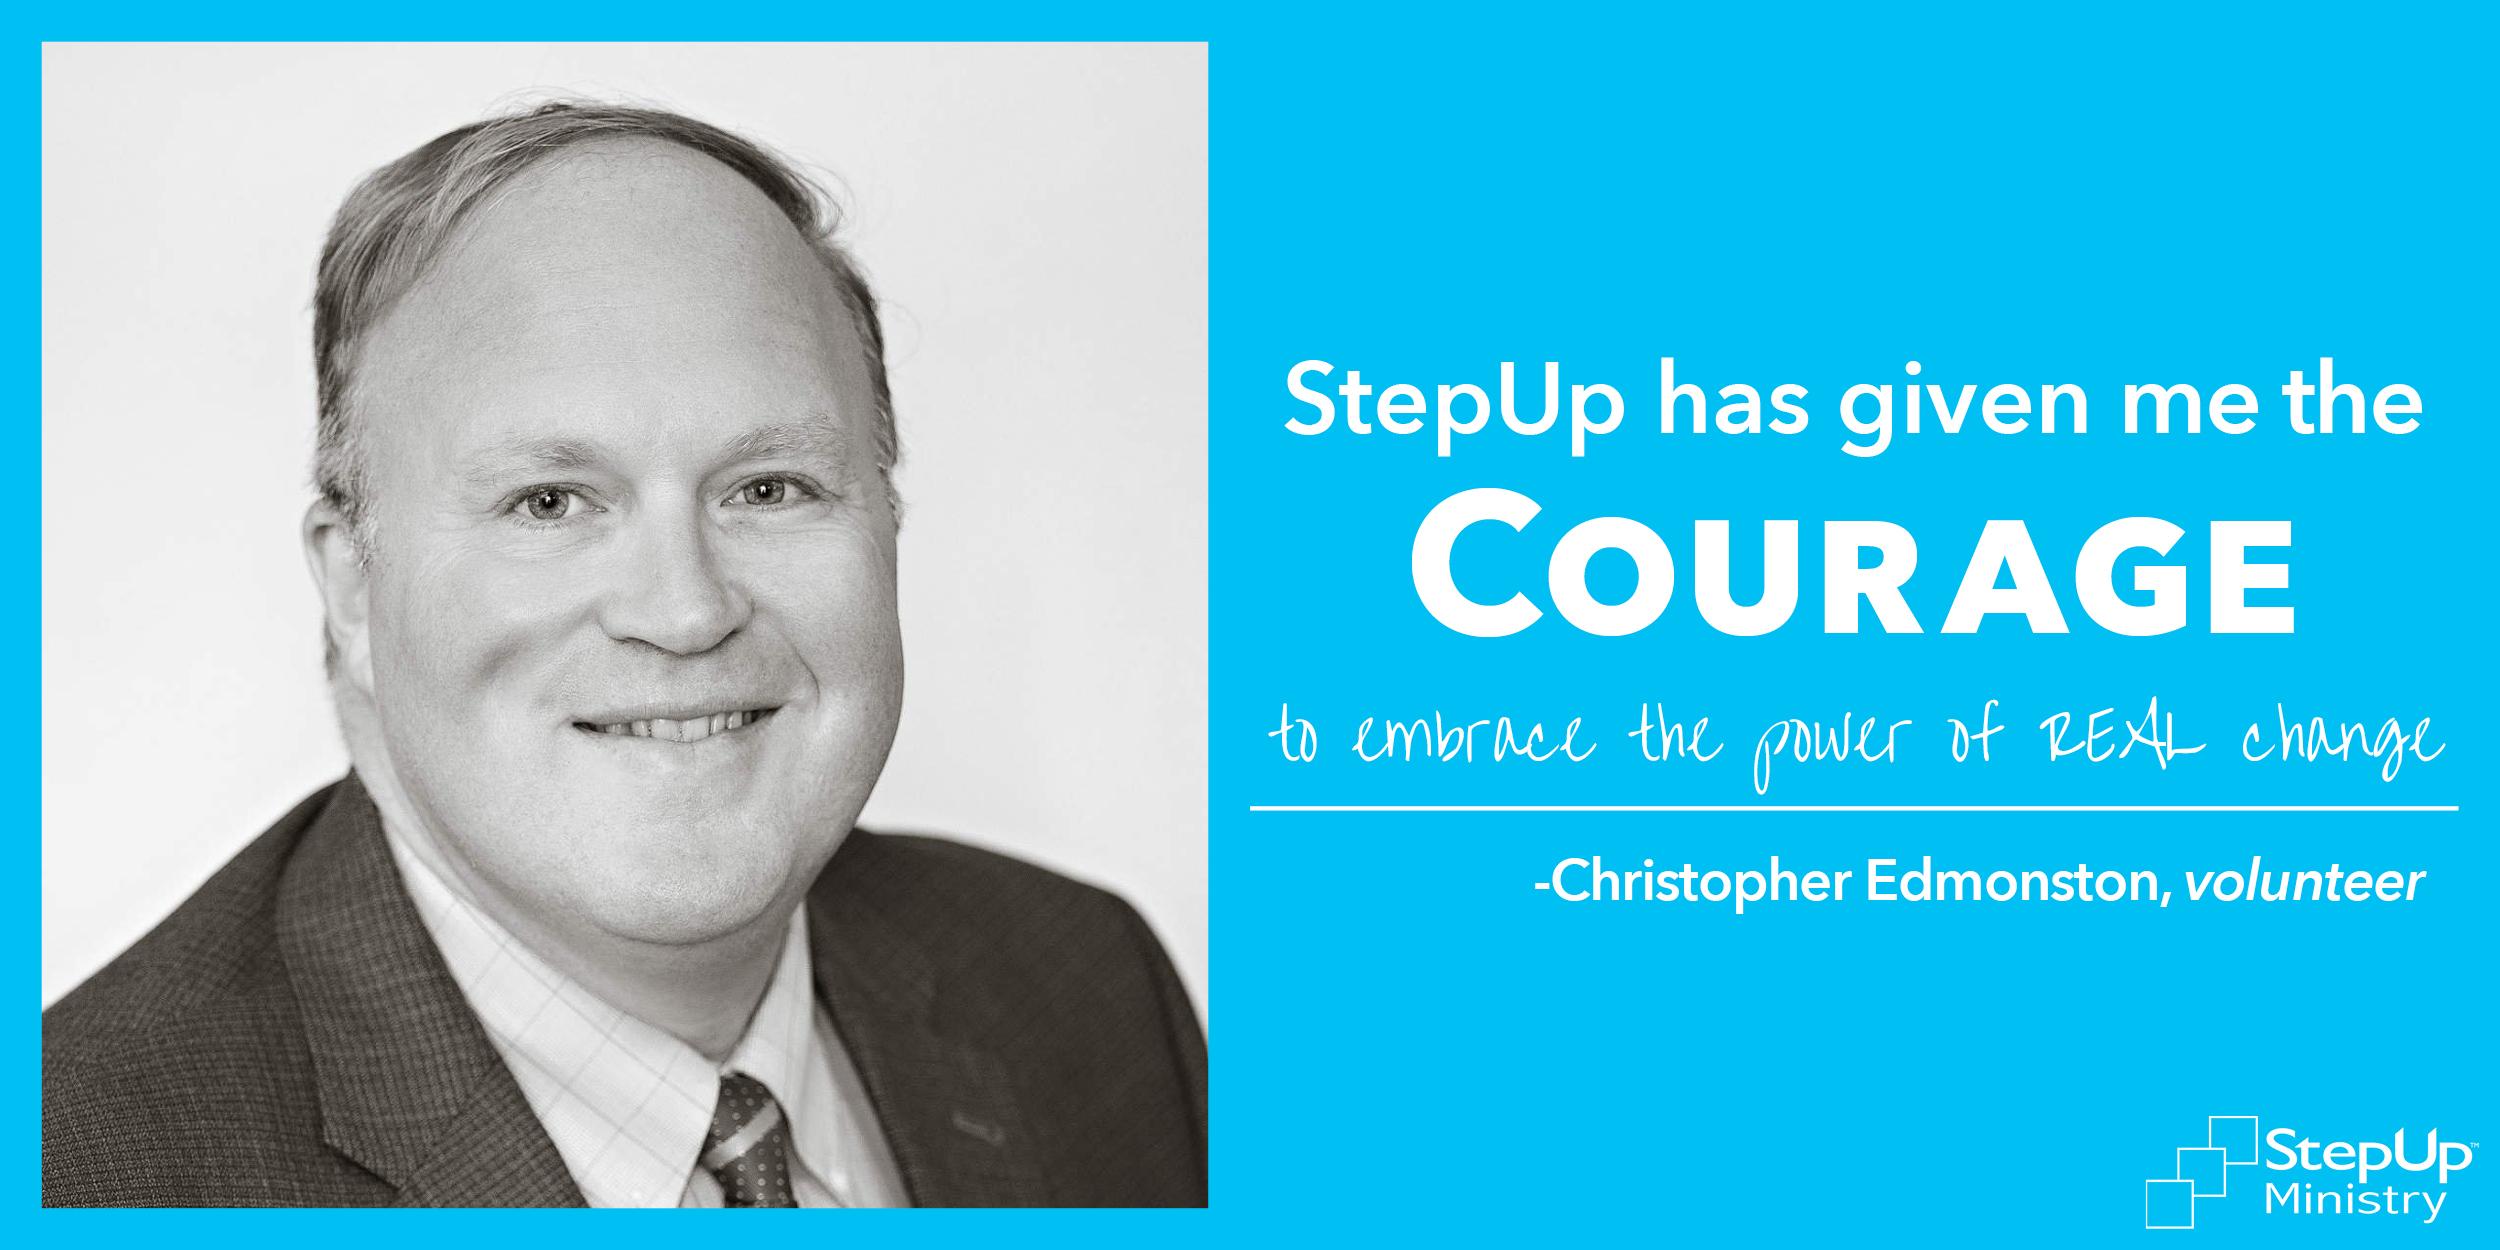 Courage To_Christopher Edmonston